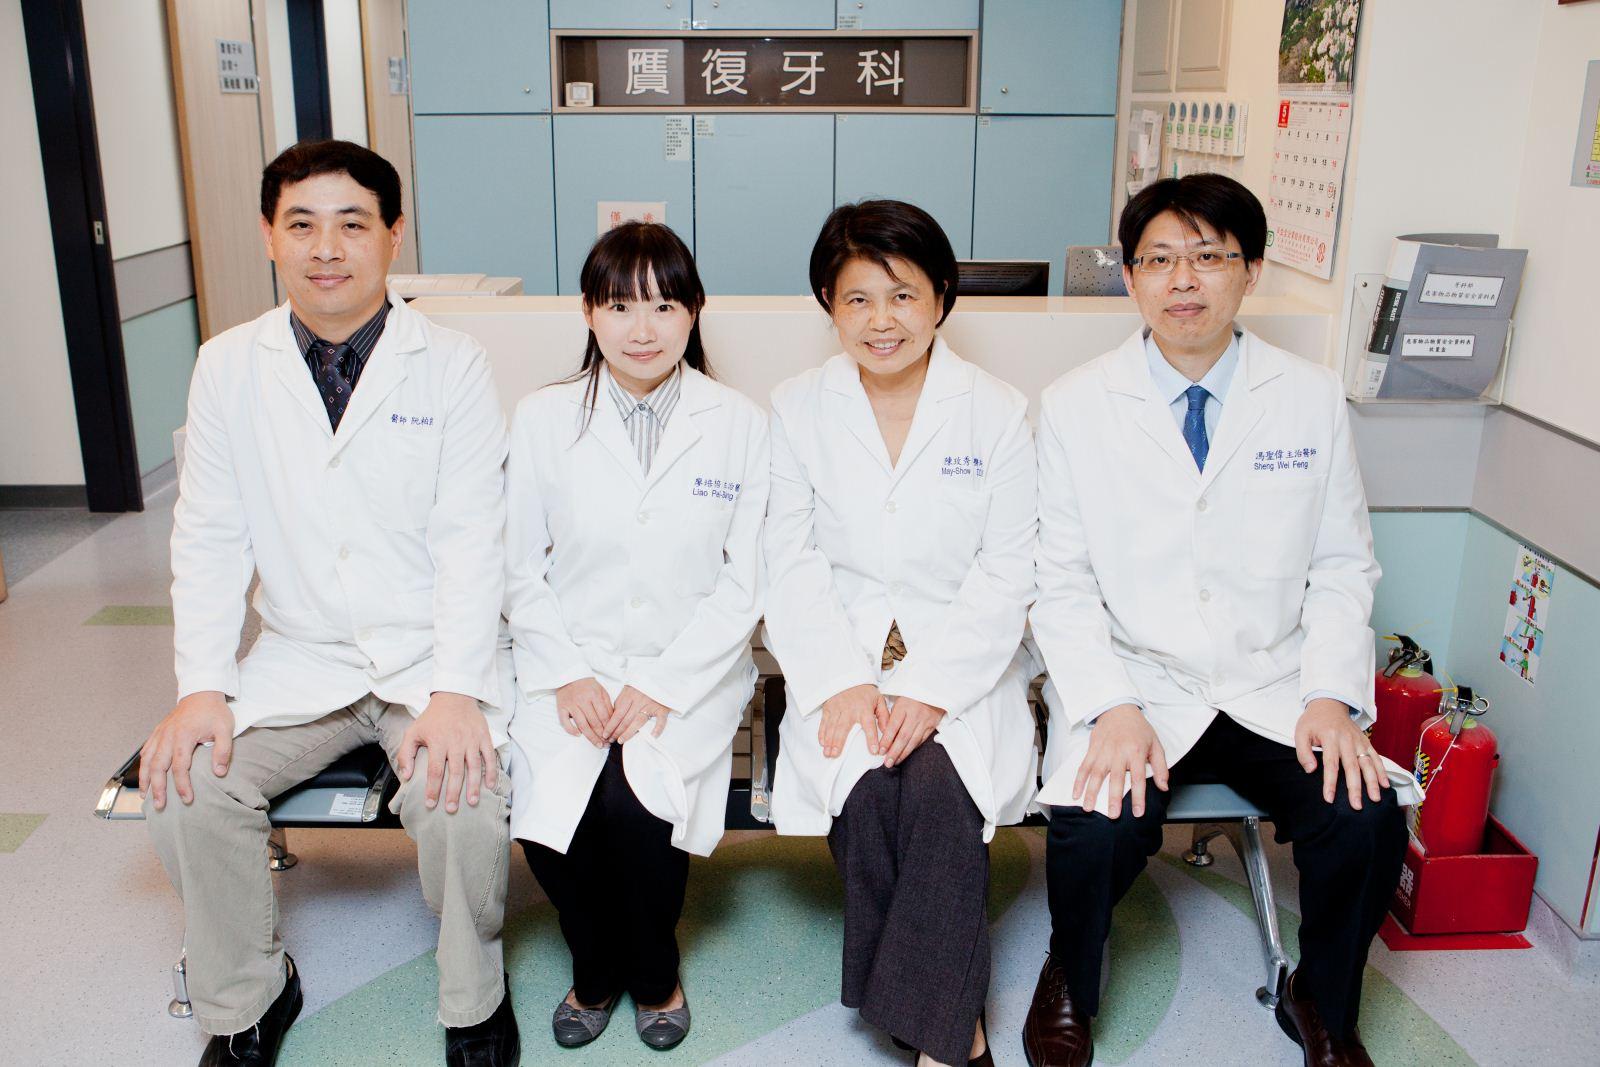 Taipei Medical University Hospital